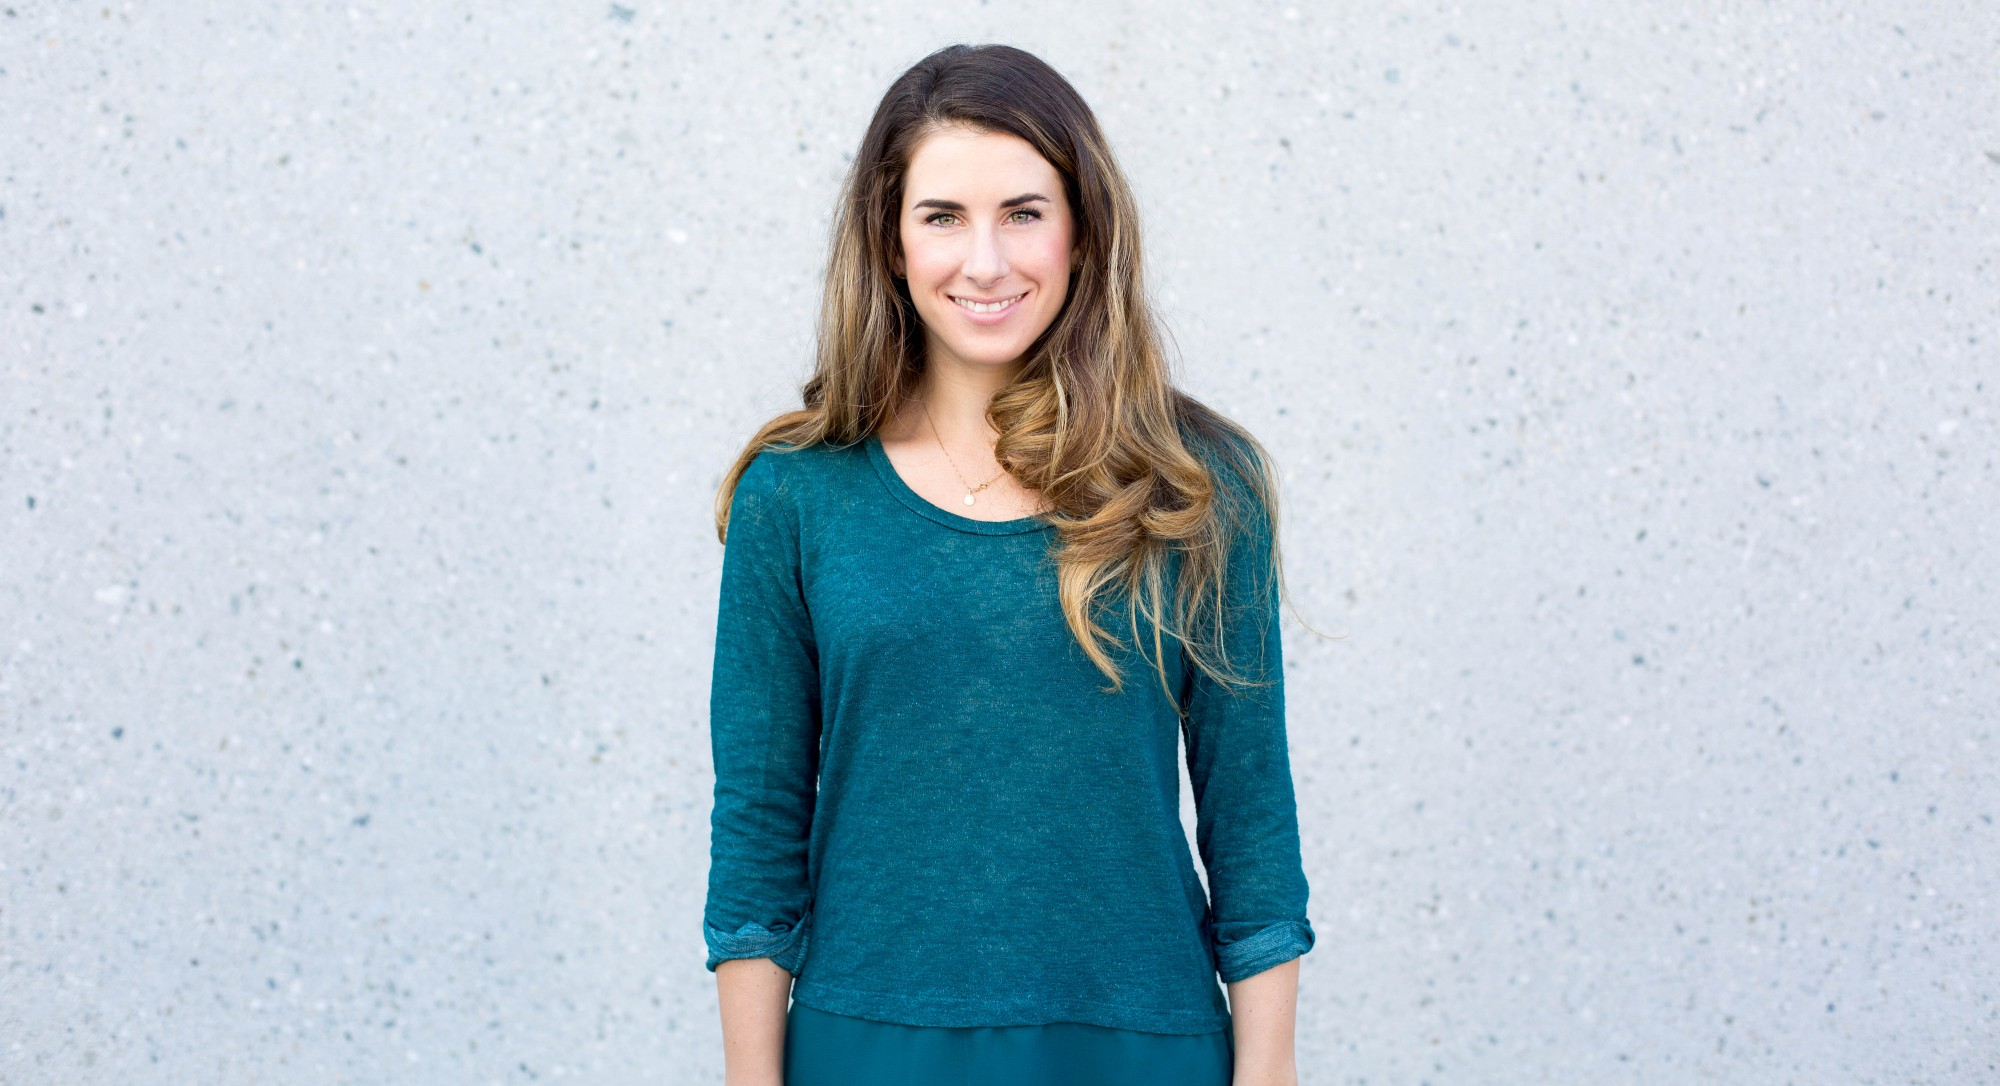 Meet Michelle Pellizzon, Thrive's Resident Health Coach